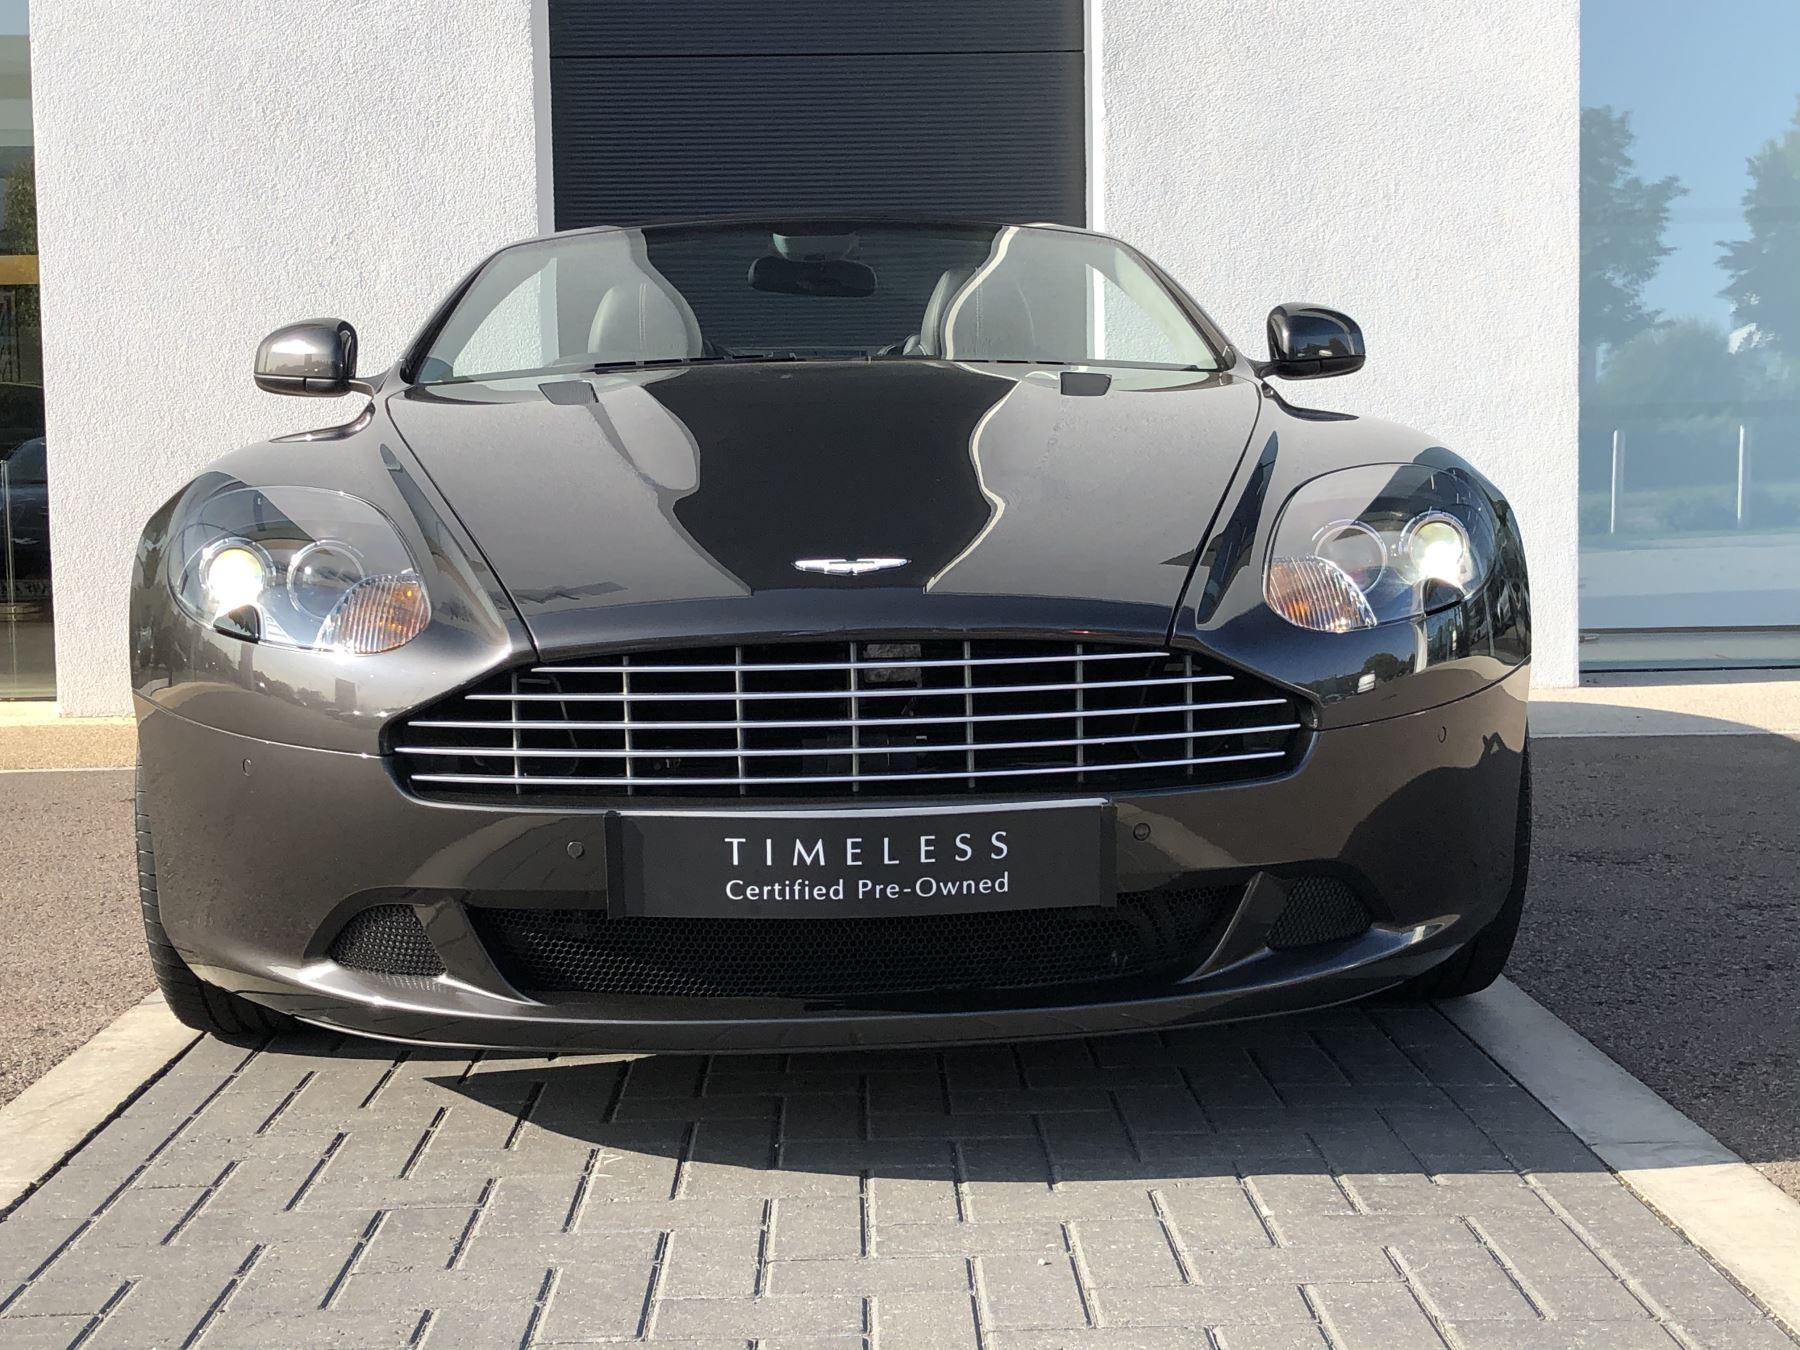 Aston Martin DB9 V12 2dr Volante Touchtronic [470] 5.9 Automatic Convertible (2013)